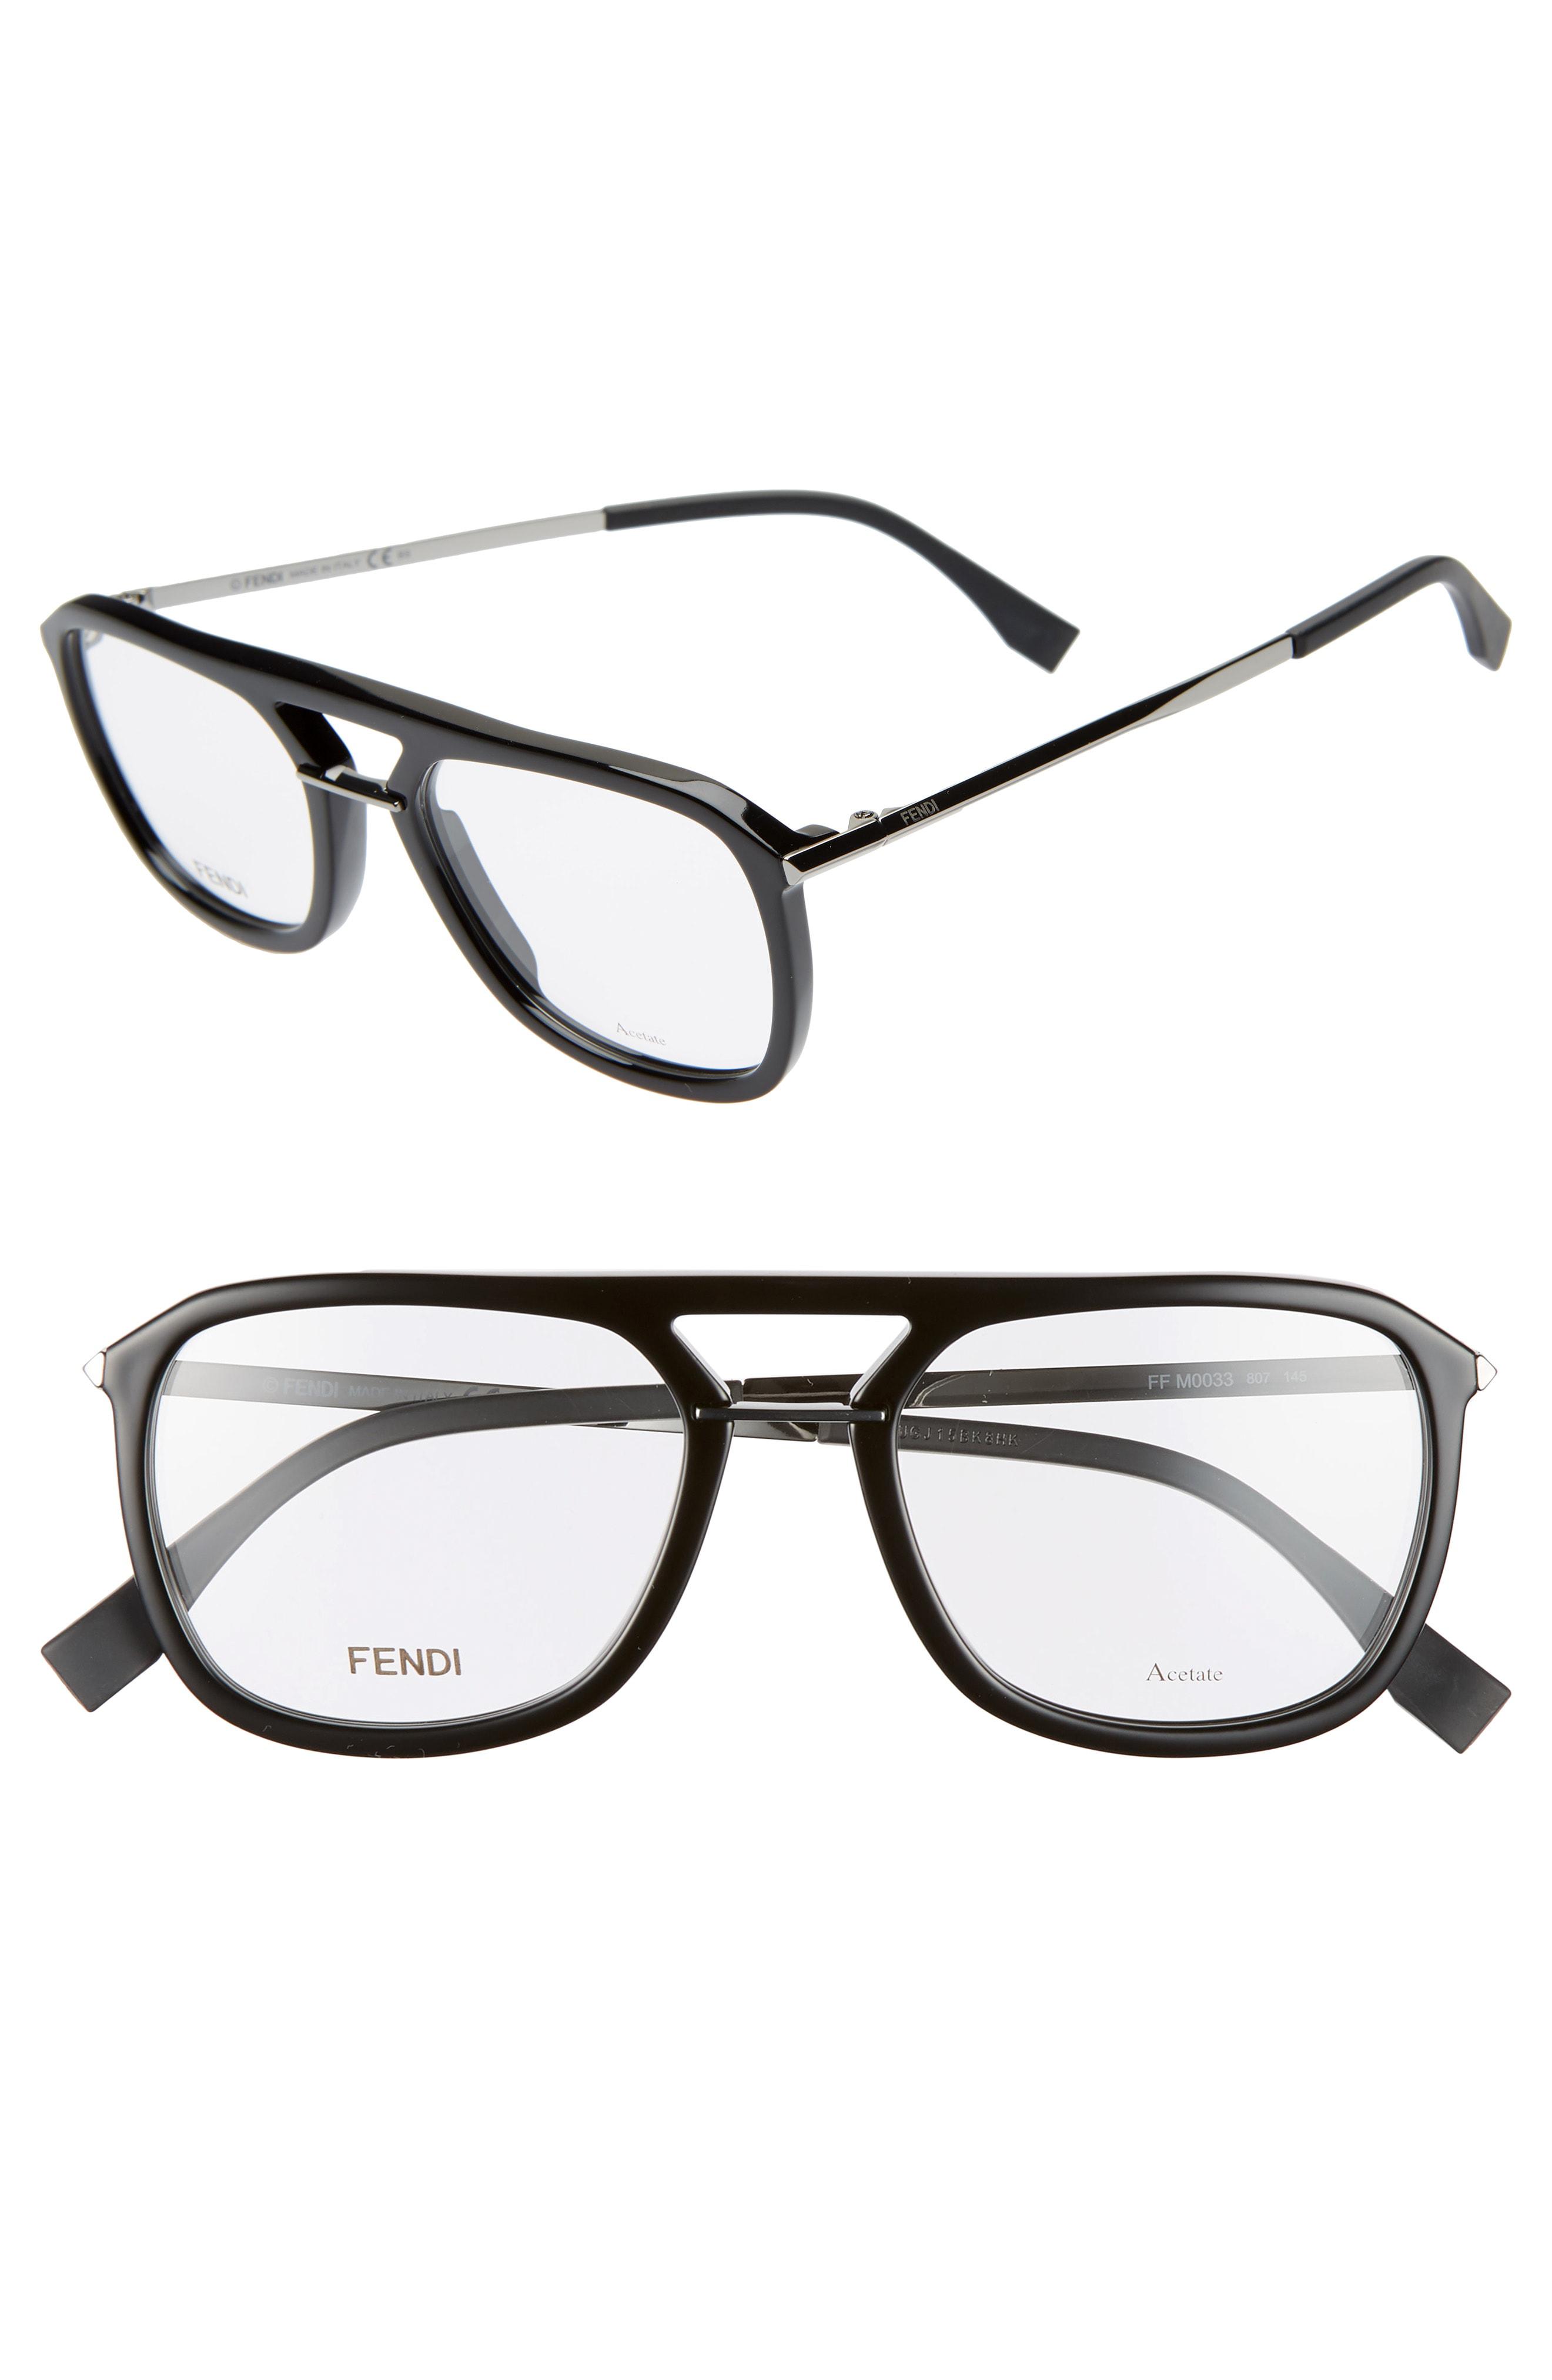 82e45b79592 Fendi 52Mm Optical Glasses - Black